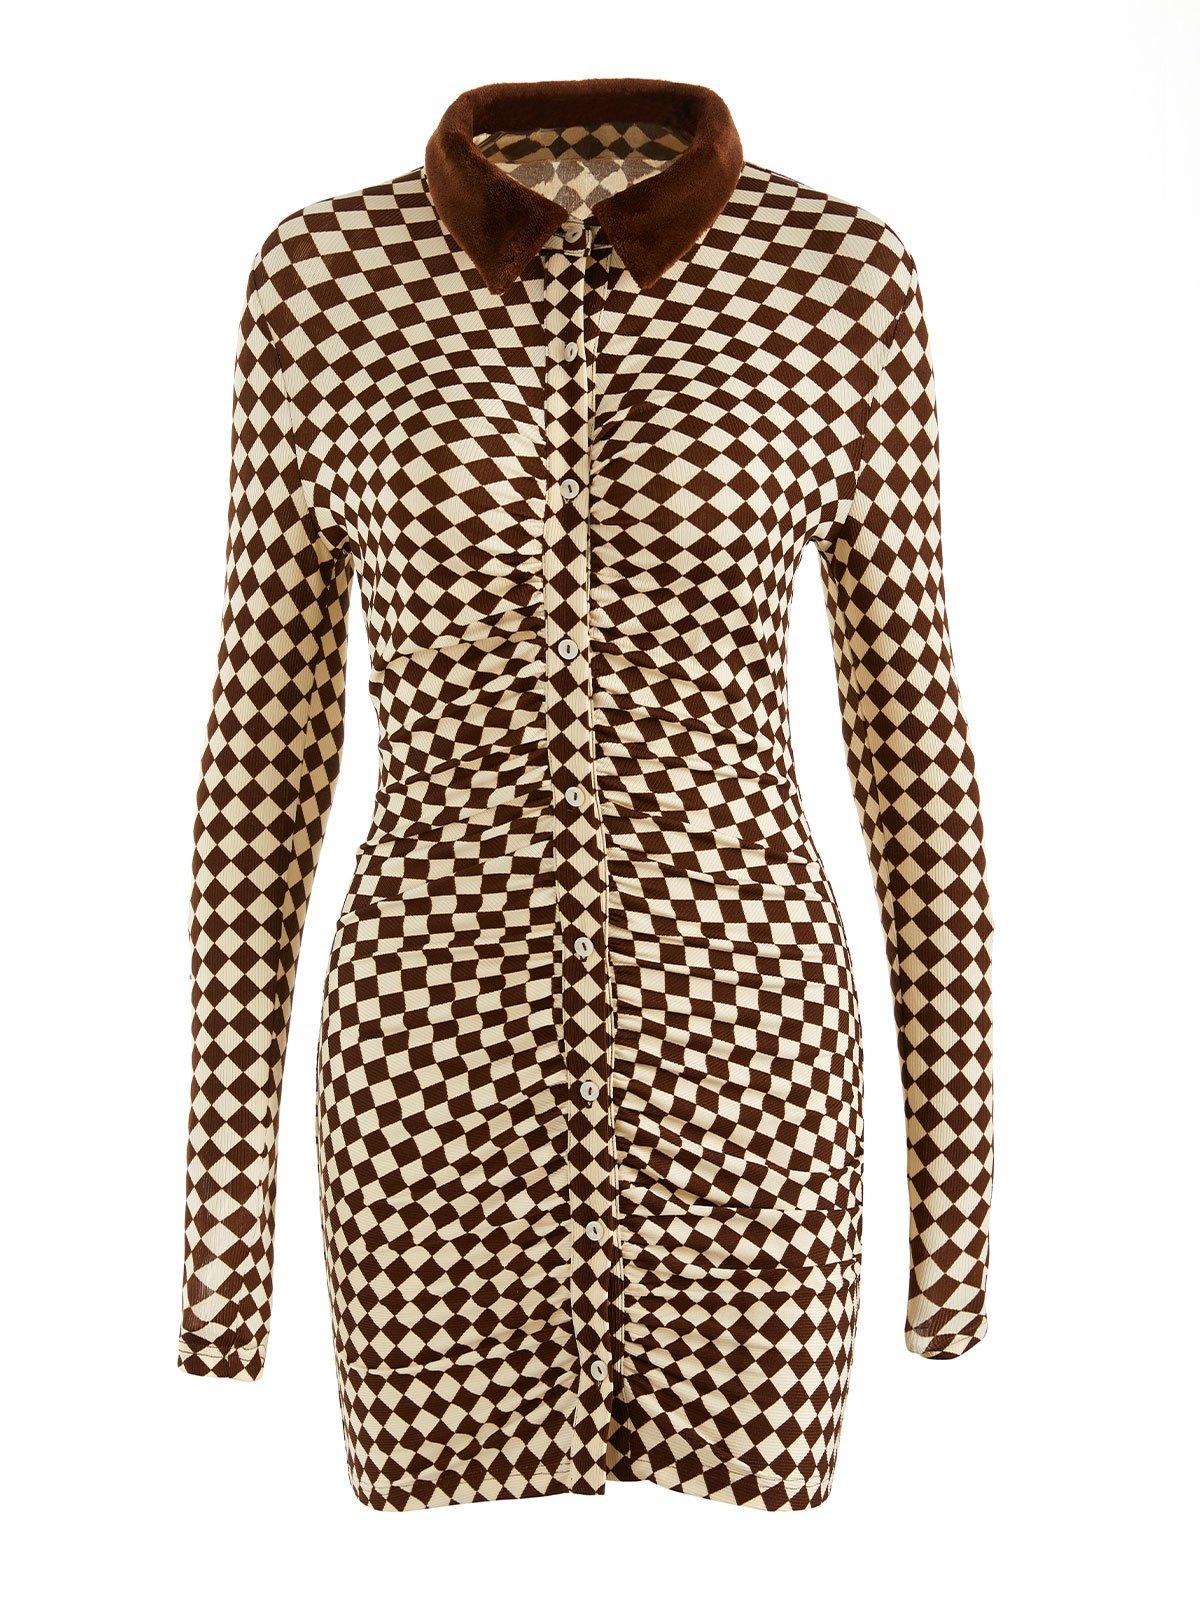 EMMIOL Polo Neck Checkered Long Sleeve Midi Dress - Brown M